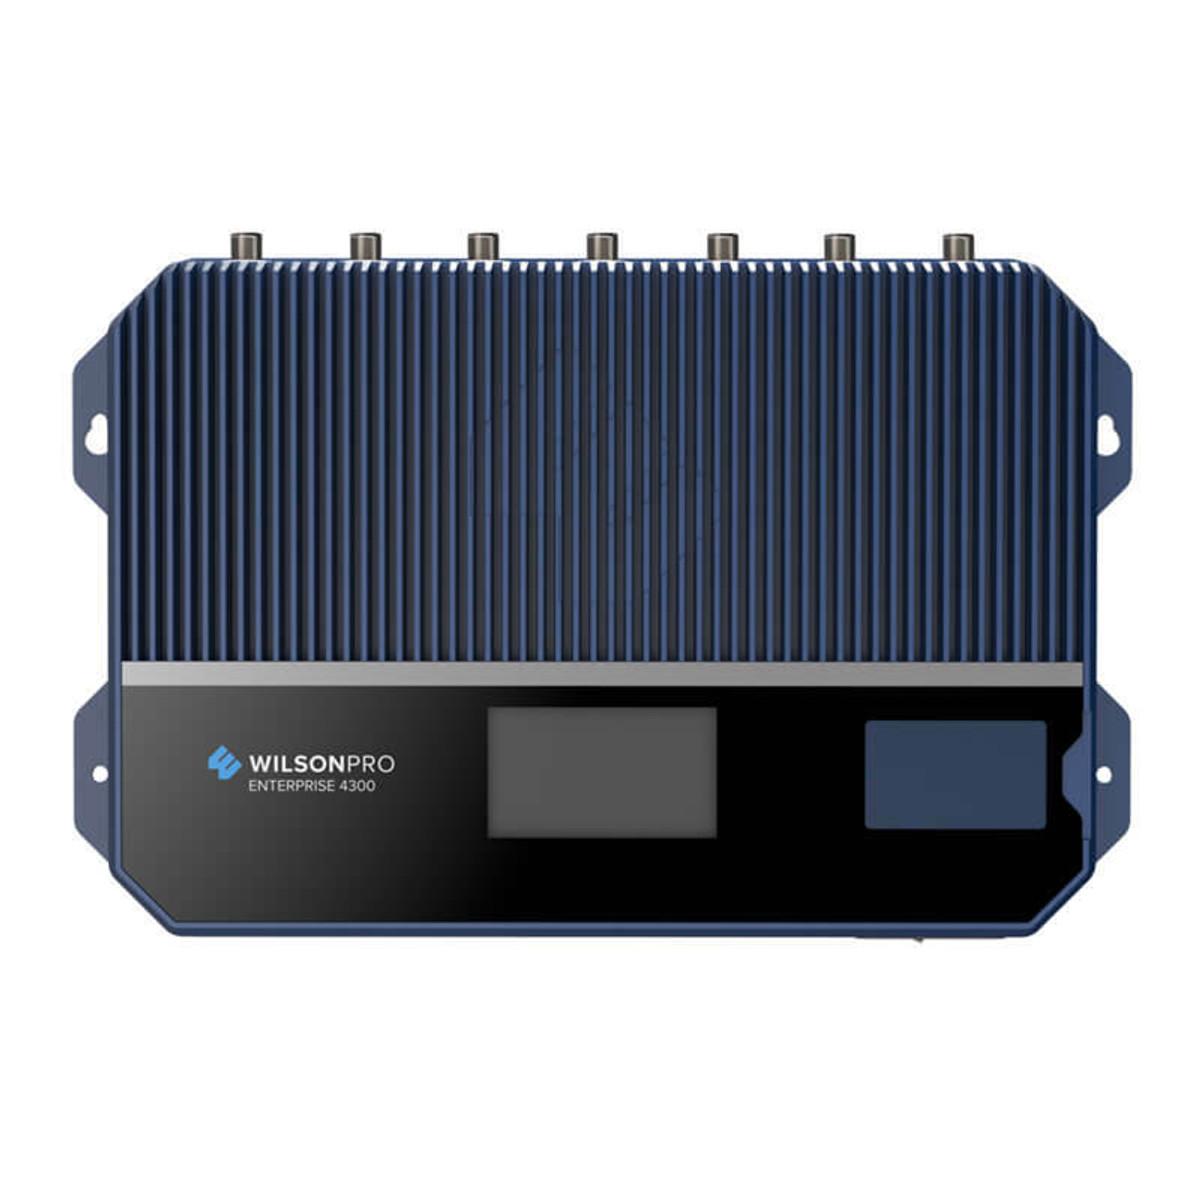 Wilson Pro WilsonPro Enterprise 4300 Commercial Signal Booster Kit - WA460152